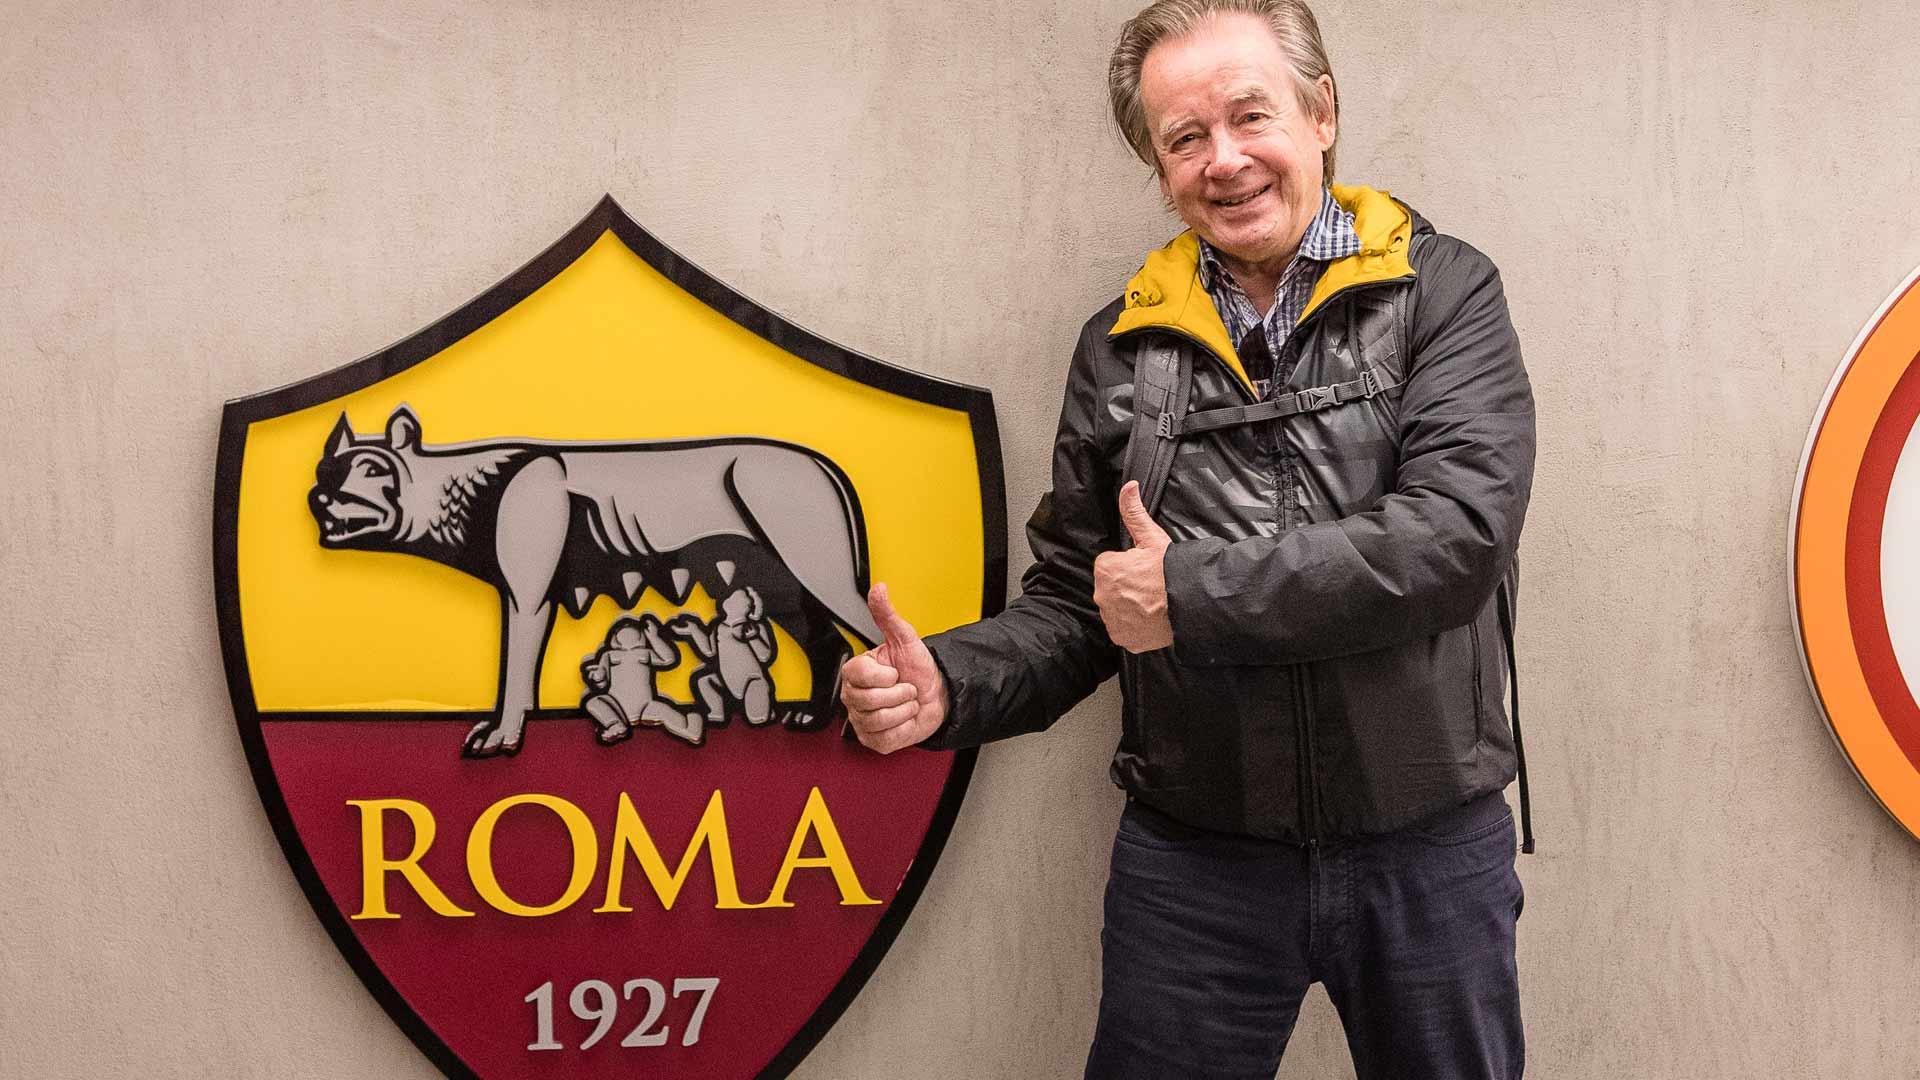 Jalkapallojoukkue A.S. Roma